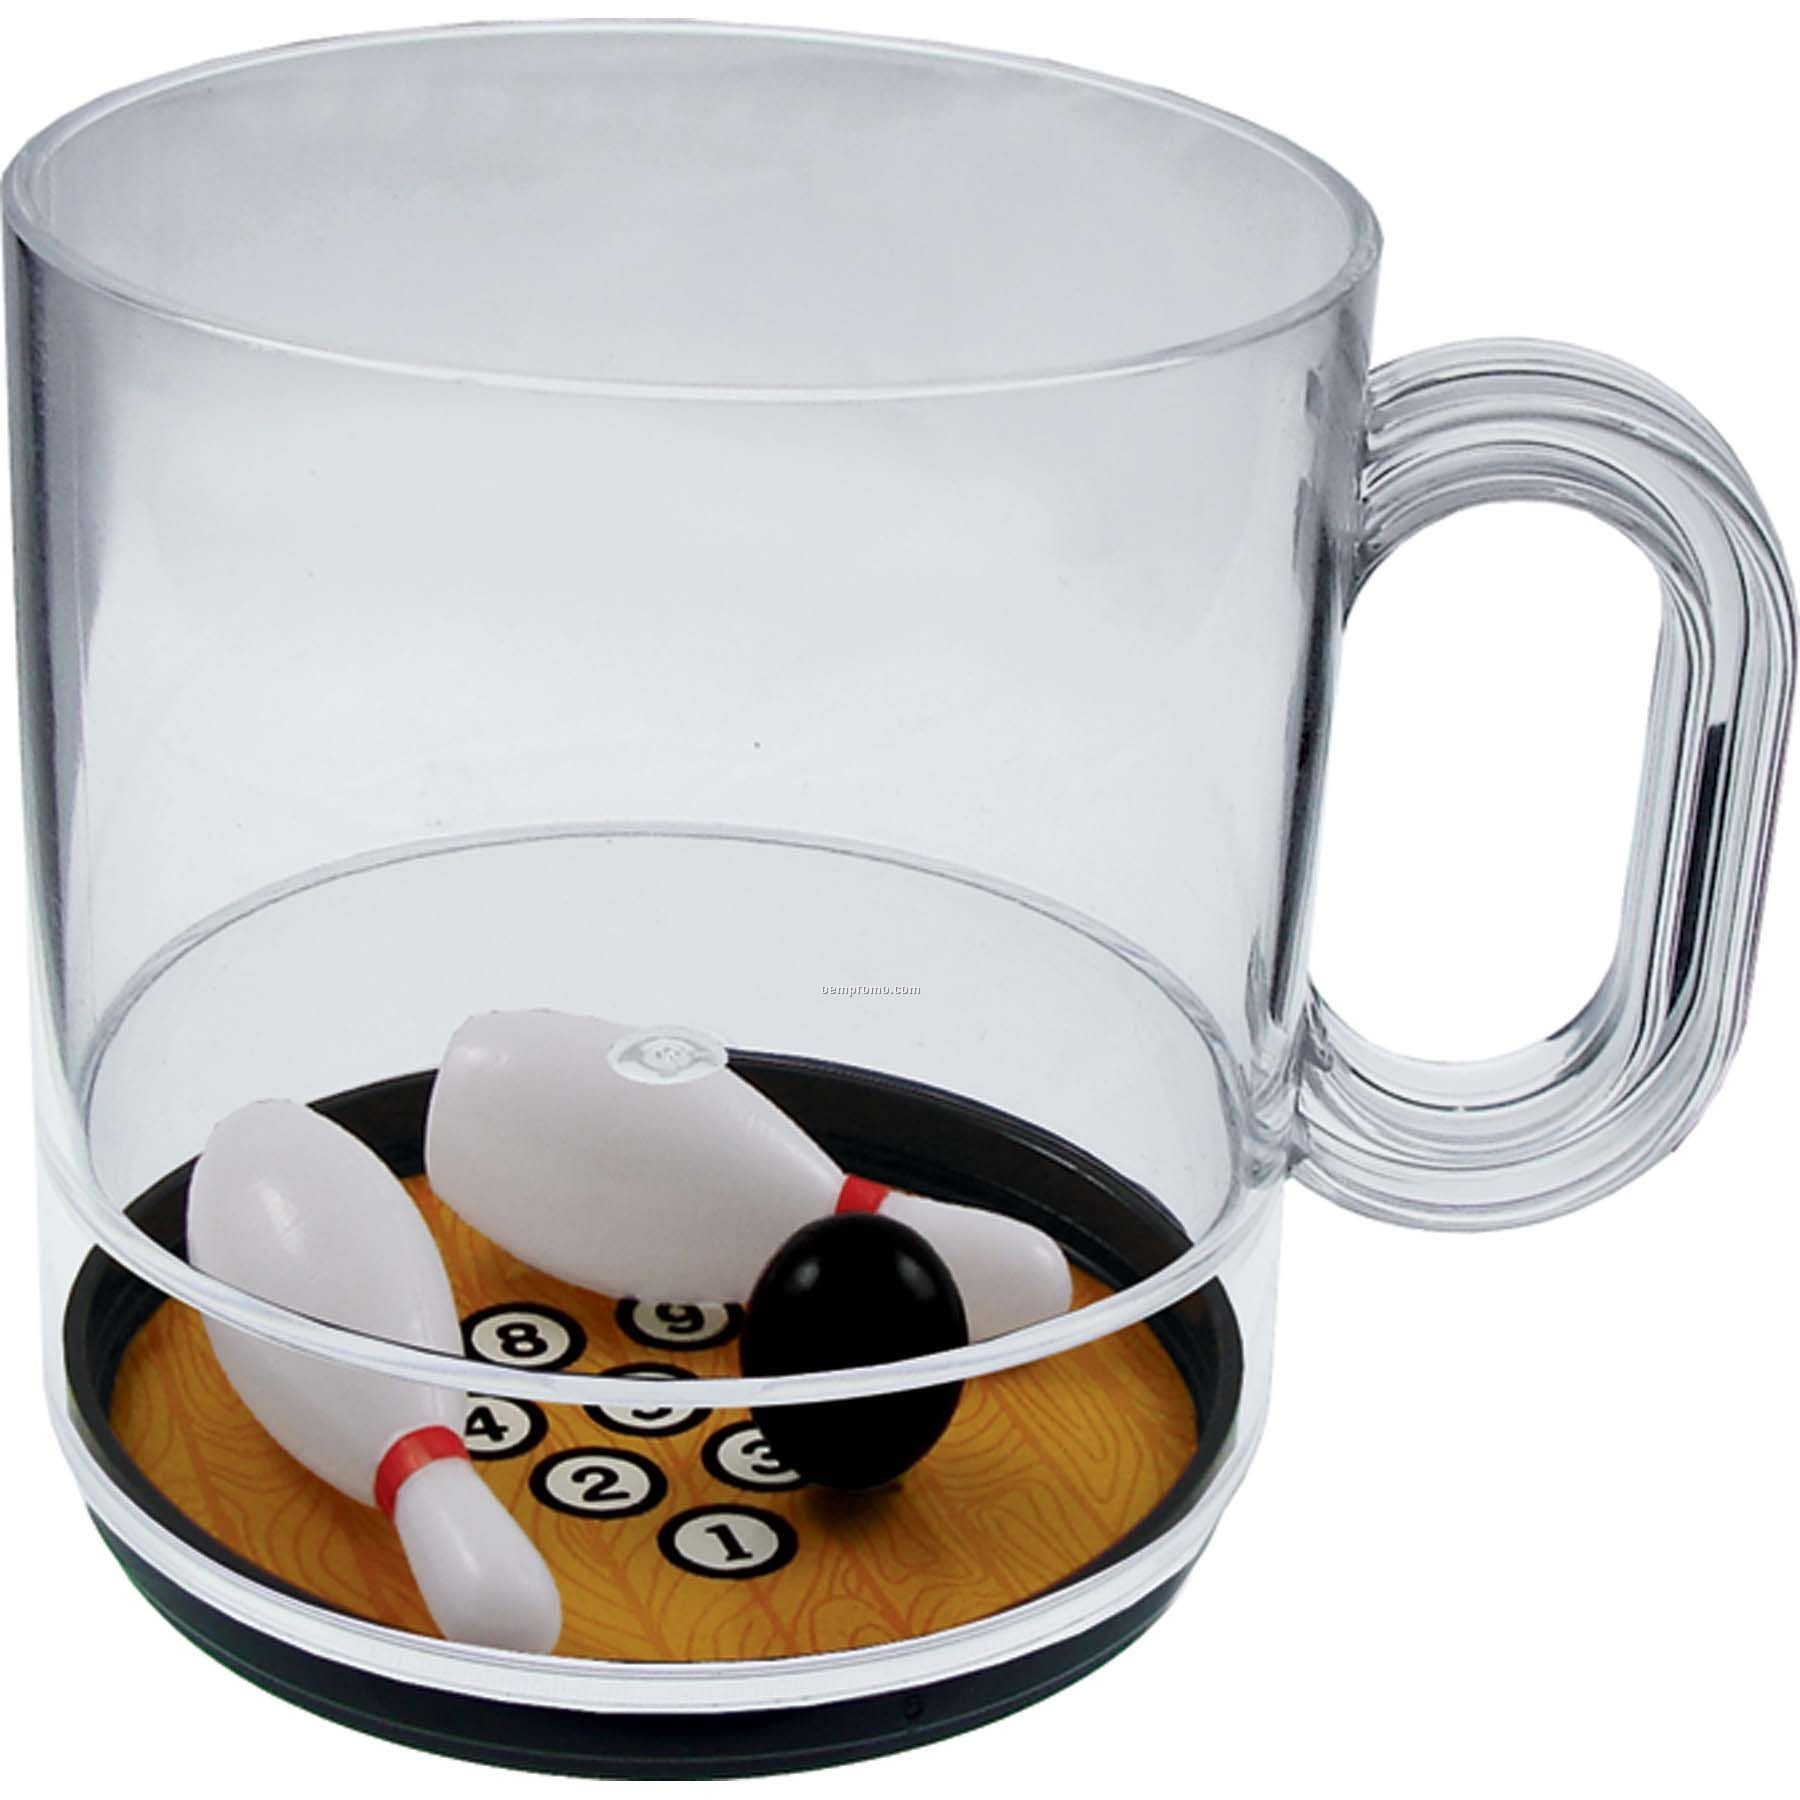 Pick It Up 12 Oz. Compartment Coffee Mug